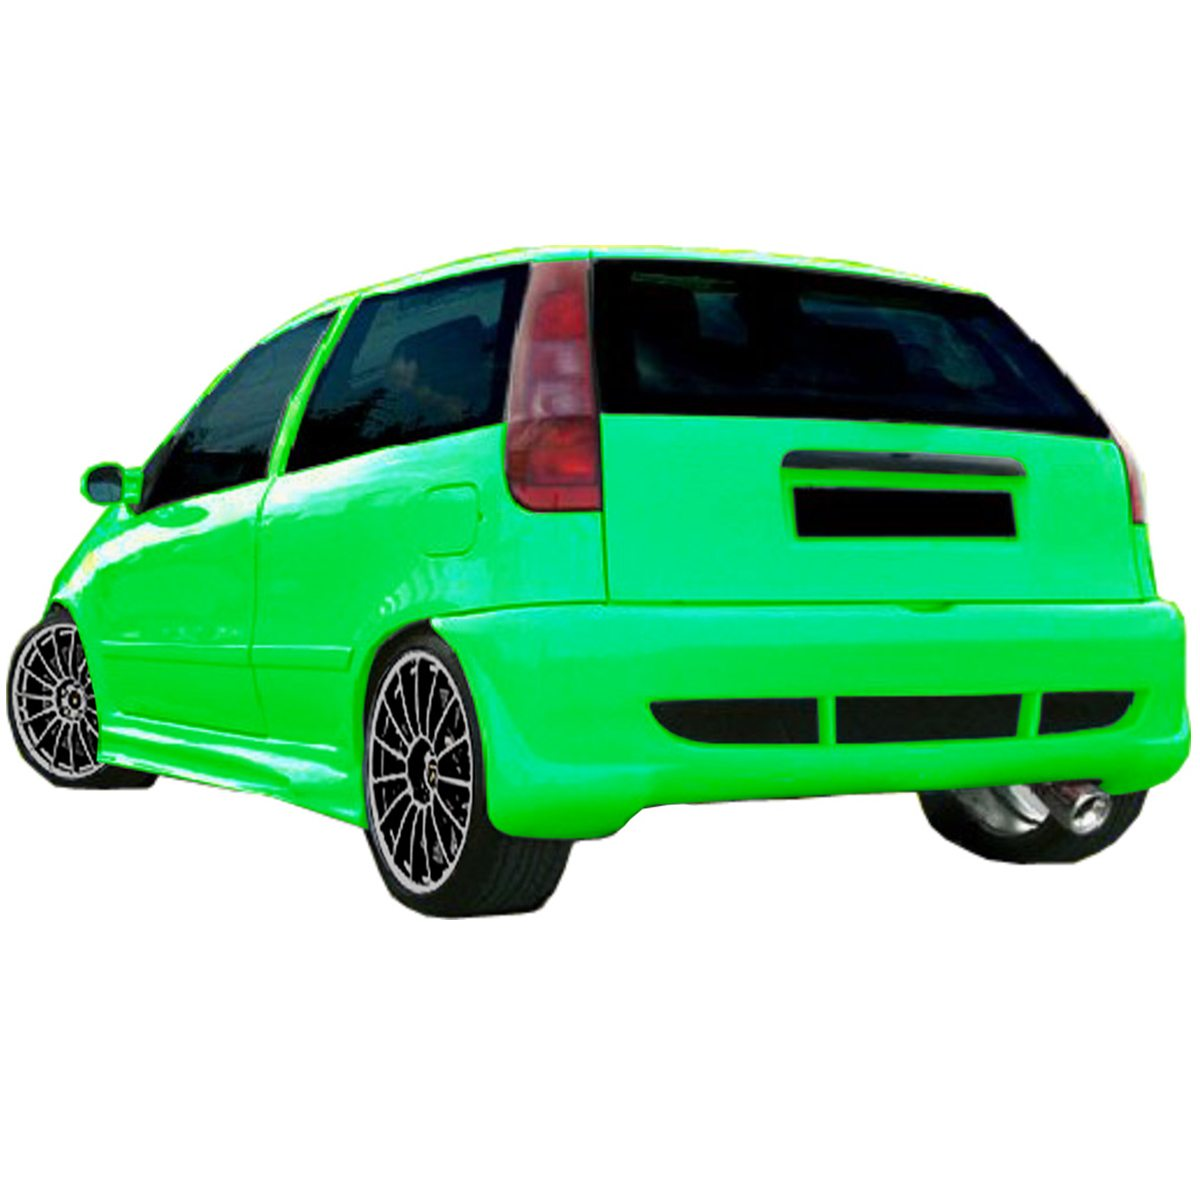 Fiat-Punto-Diablo-II-Tras-PCU0262